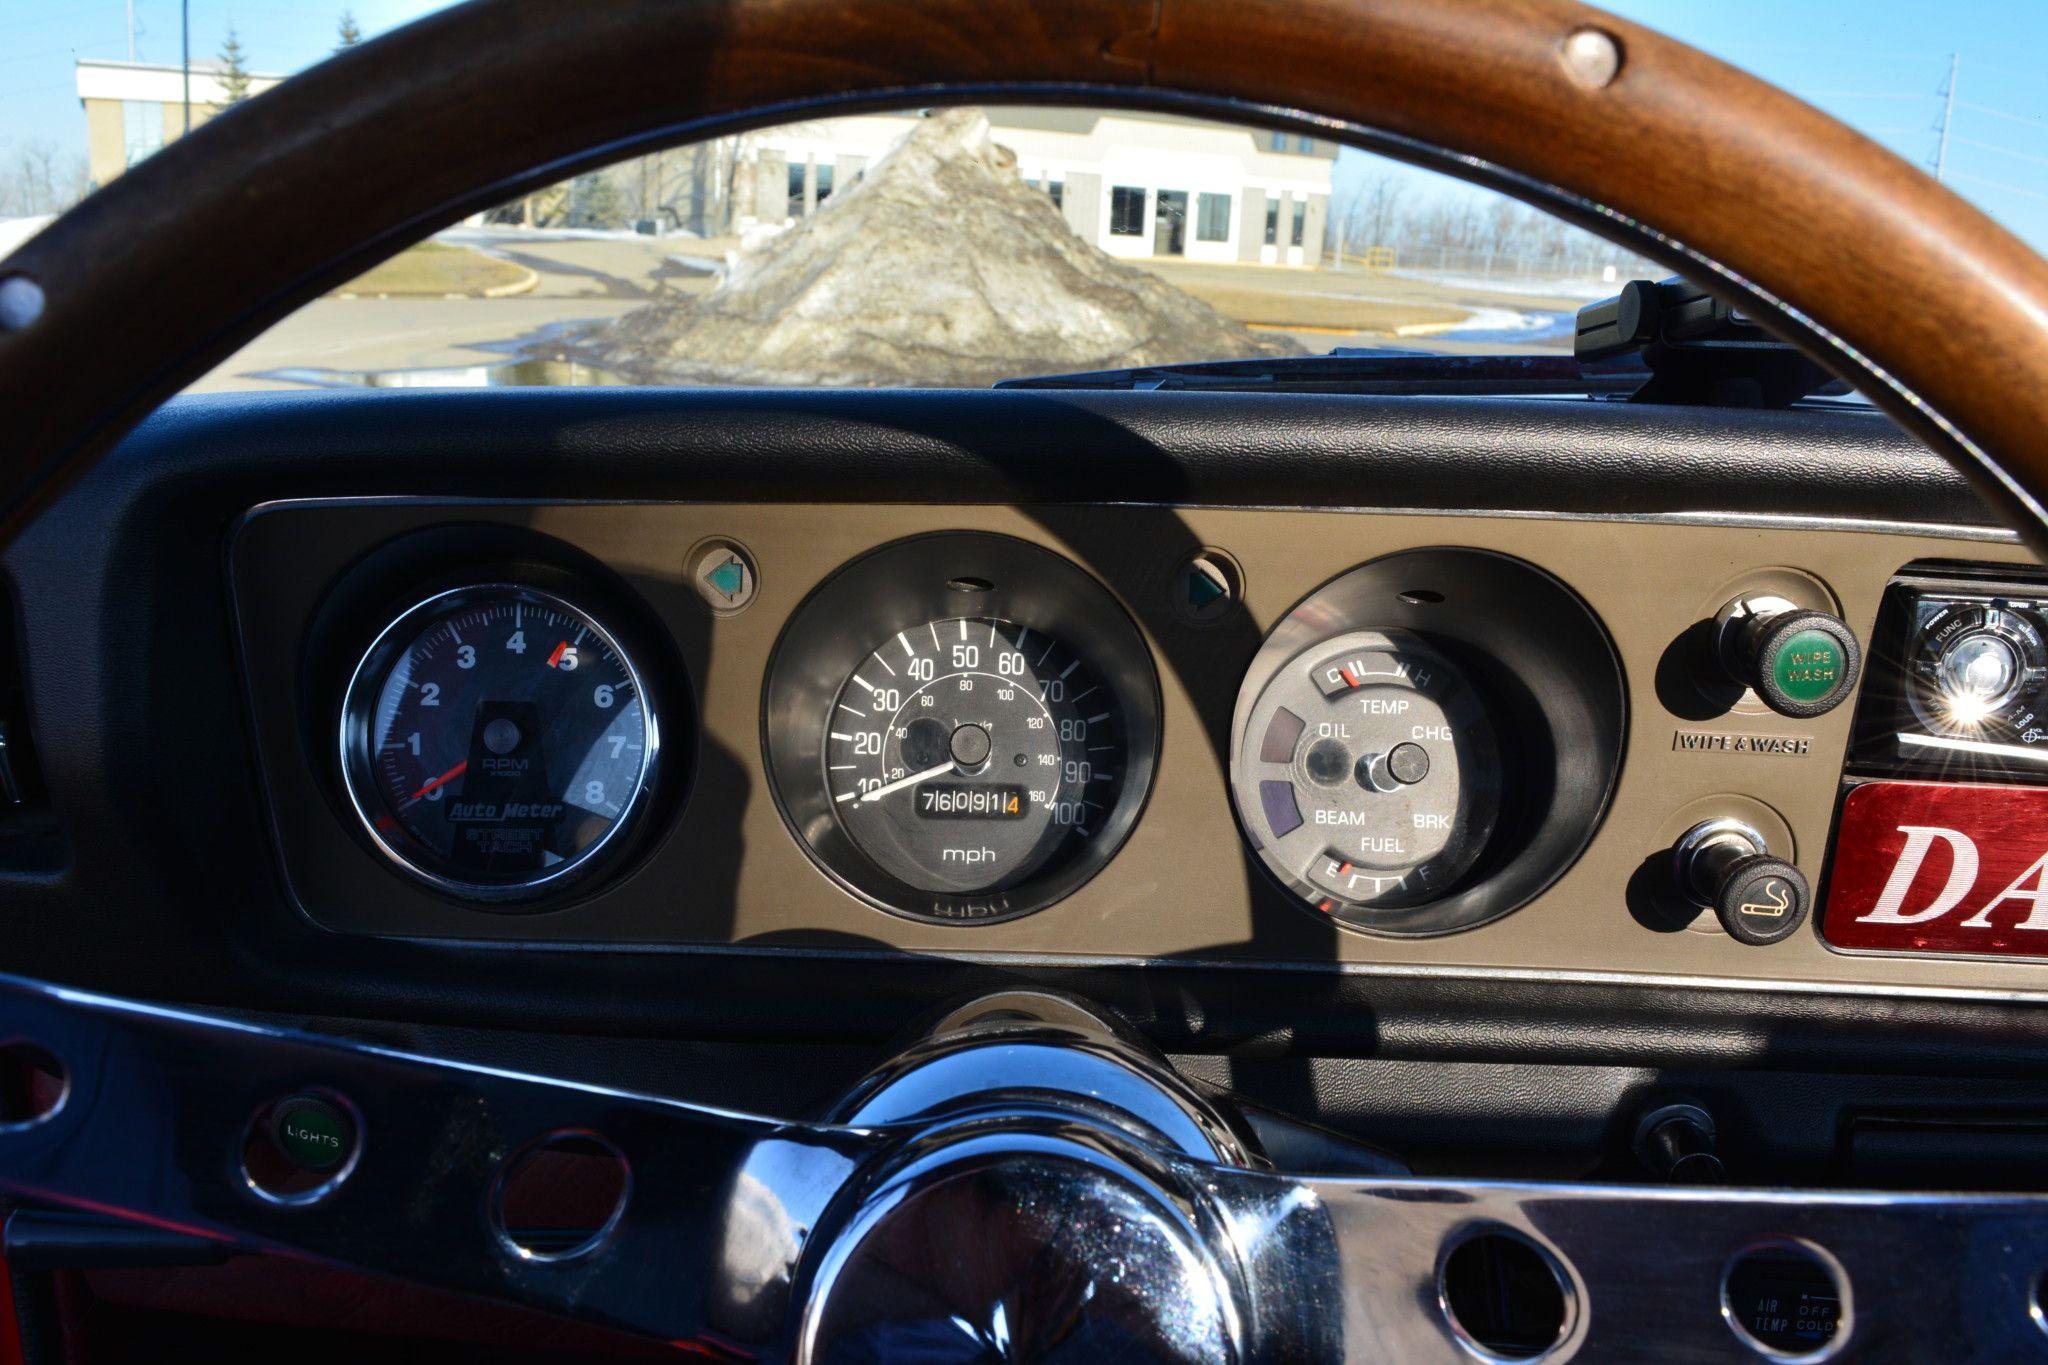 1974 Datsun 620 Pickup Datsun Fender Flares Datsun Pickup